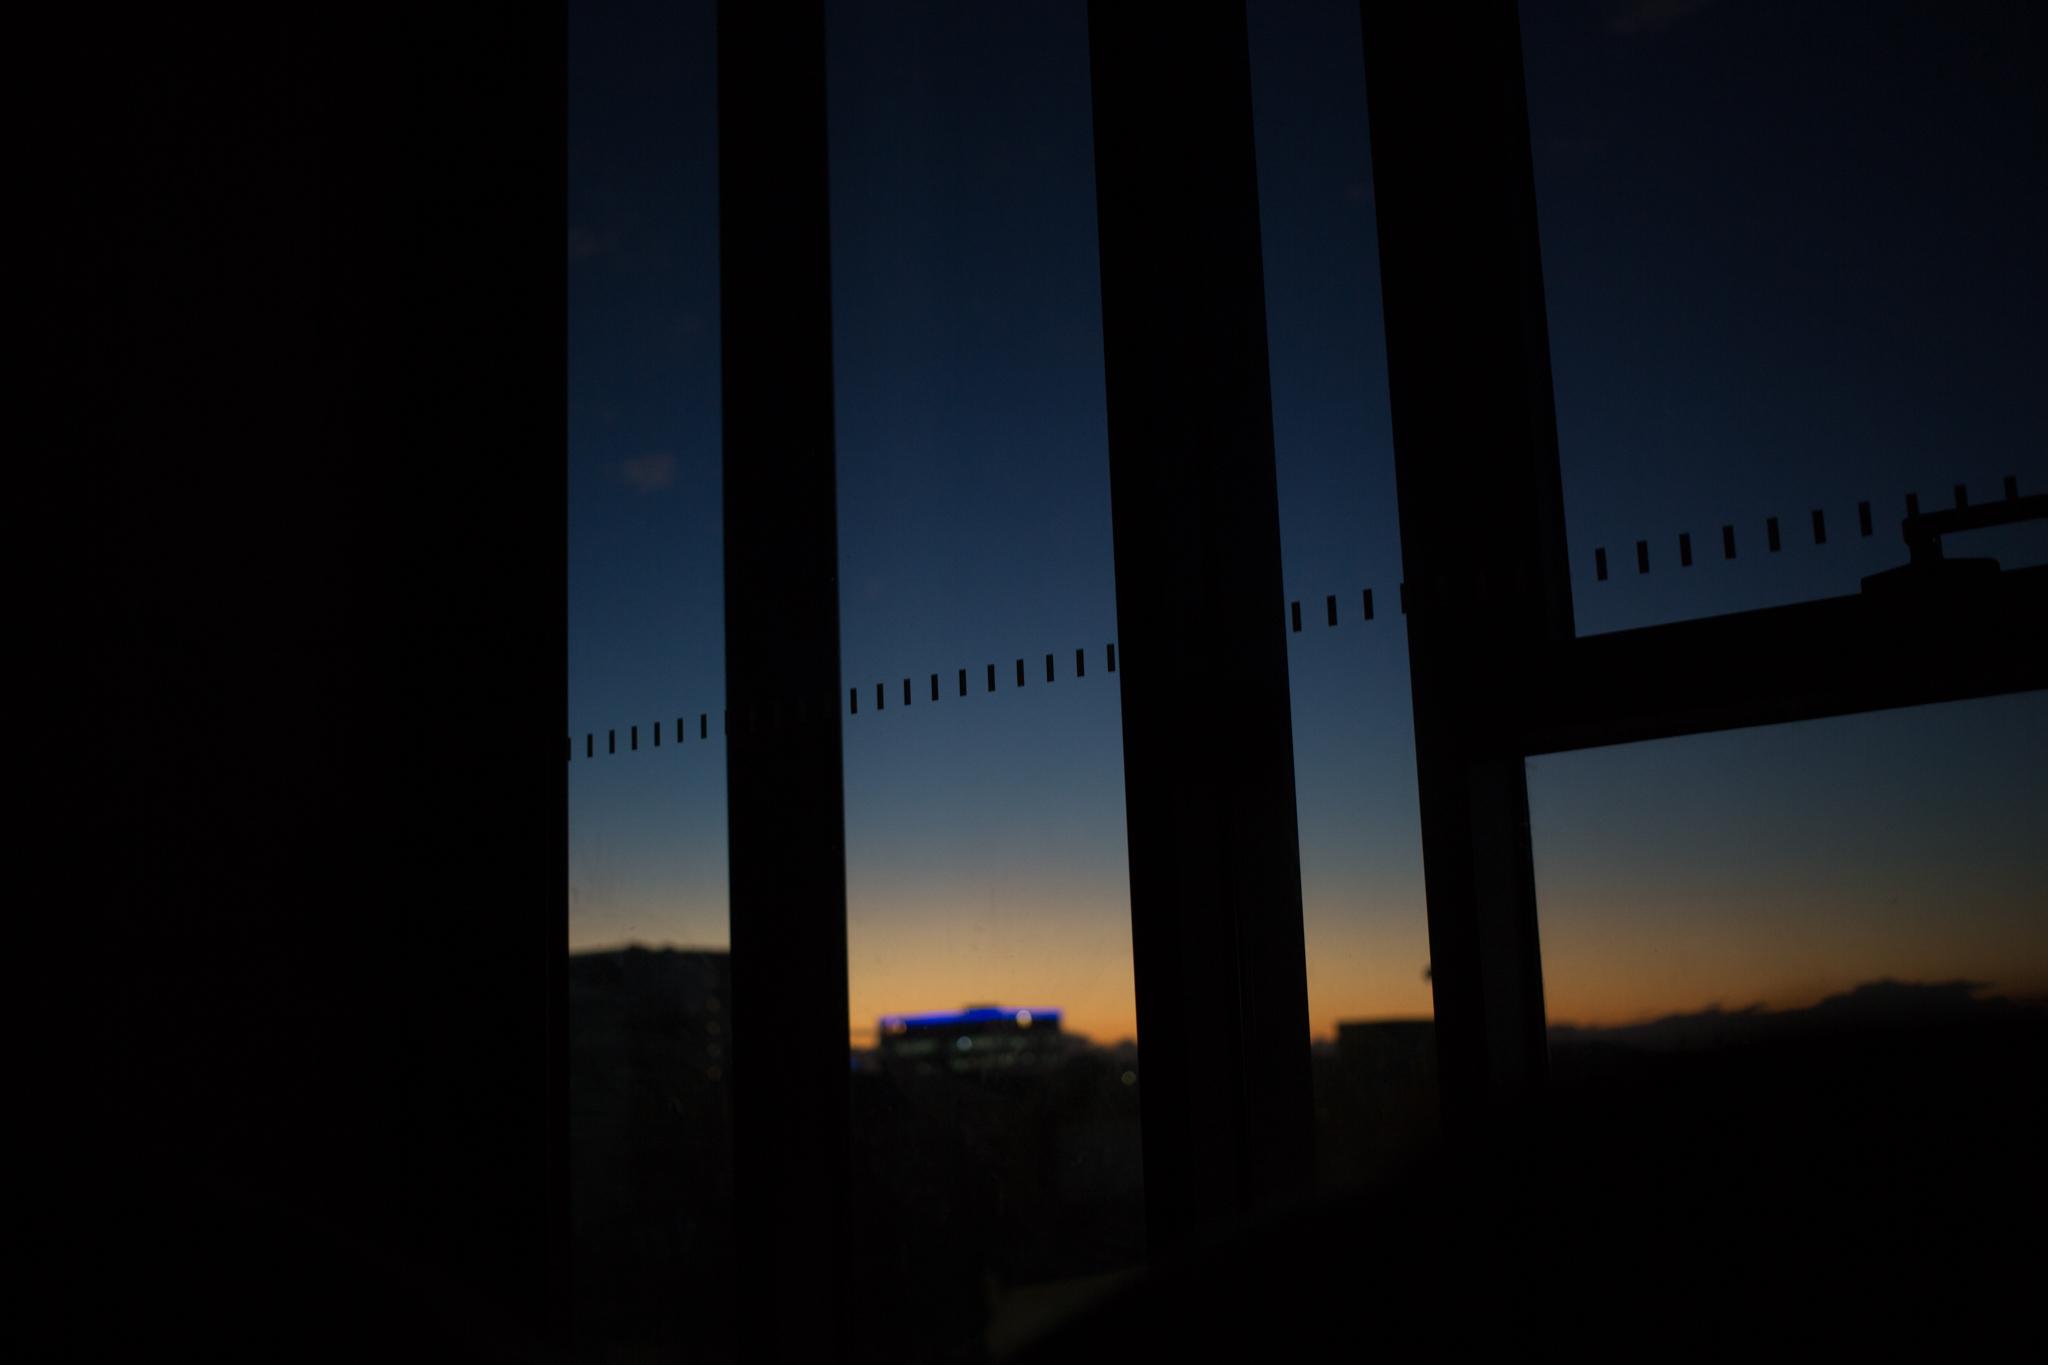 UntappedMedia-Aus2018-brisbane_AI9A4605_lo.jpg